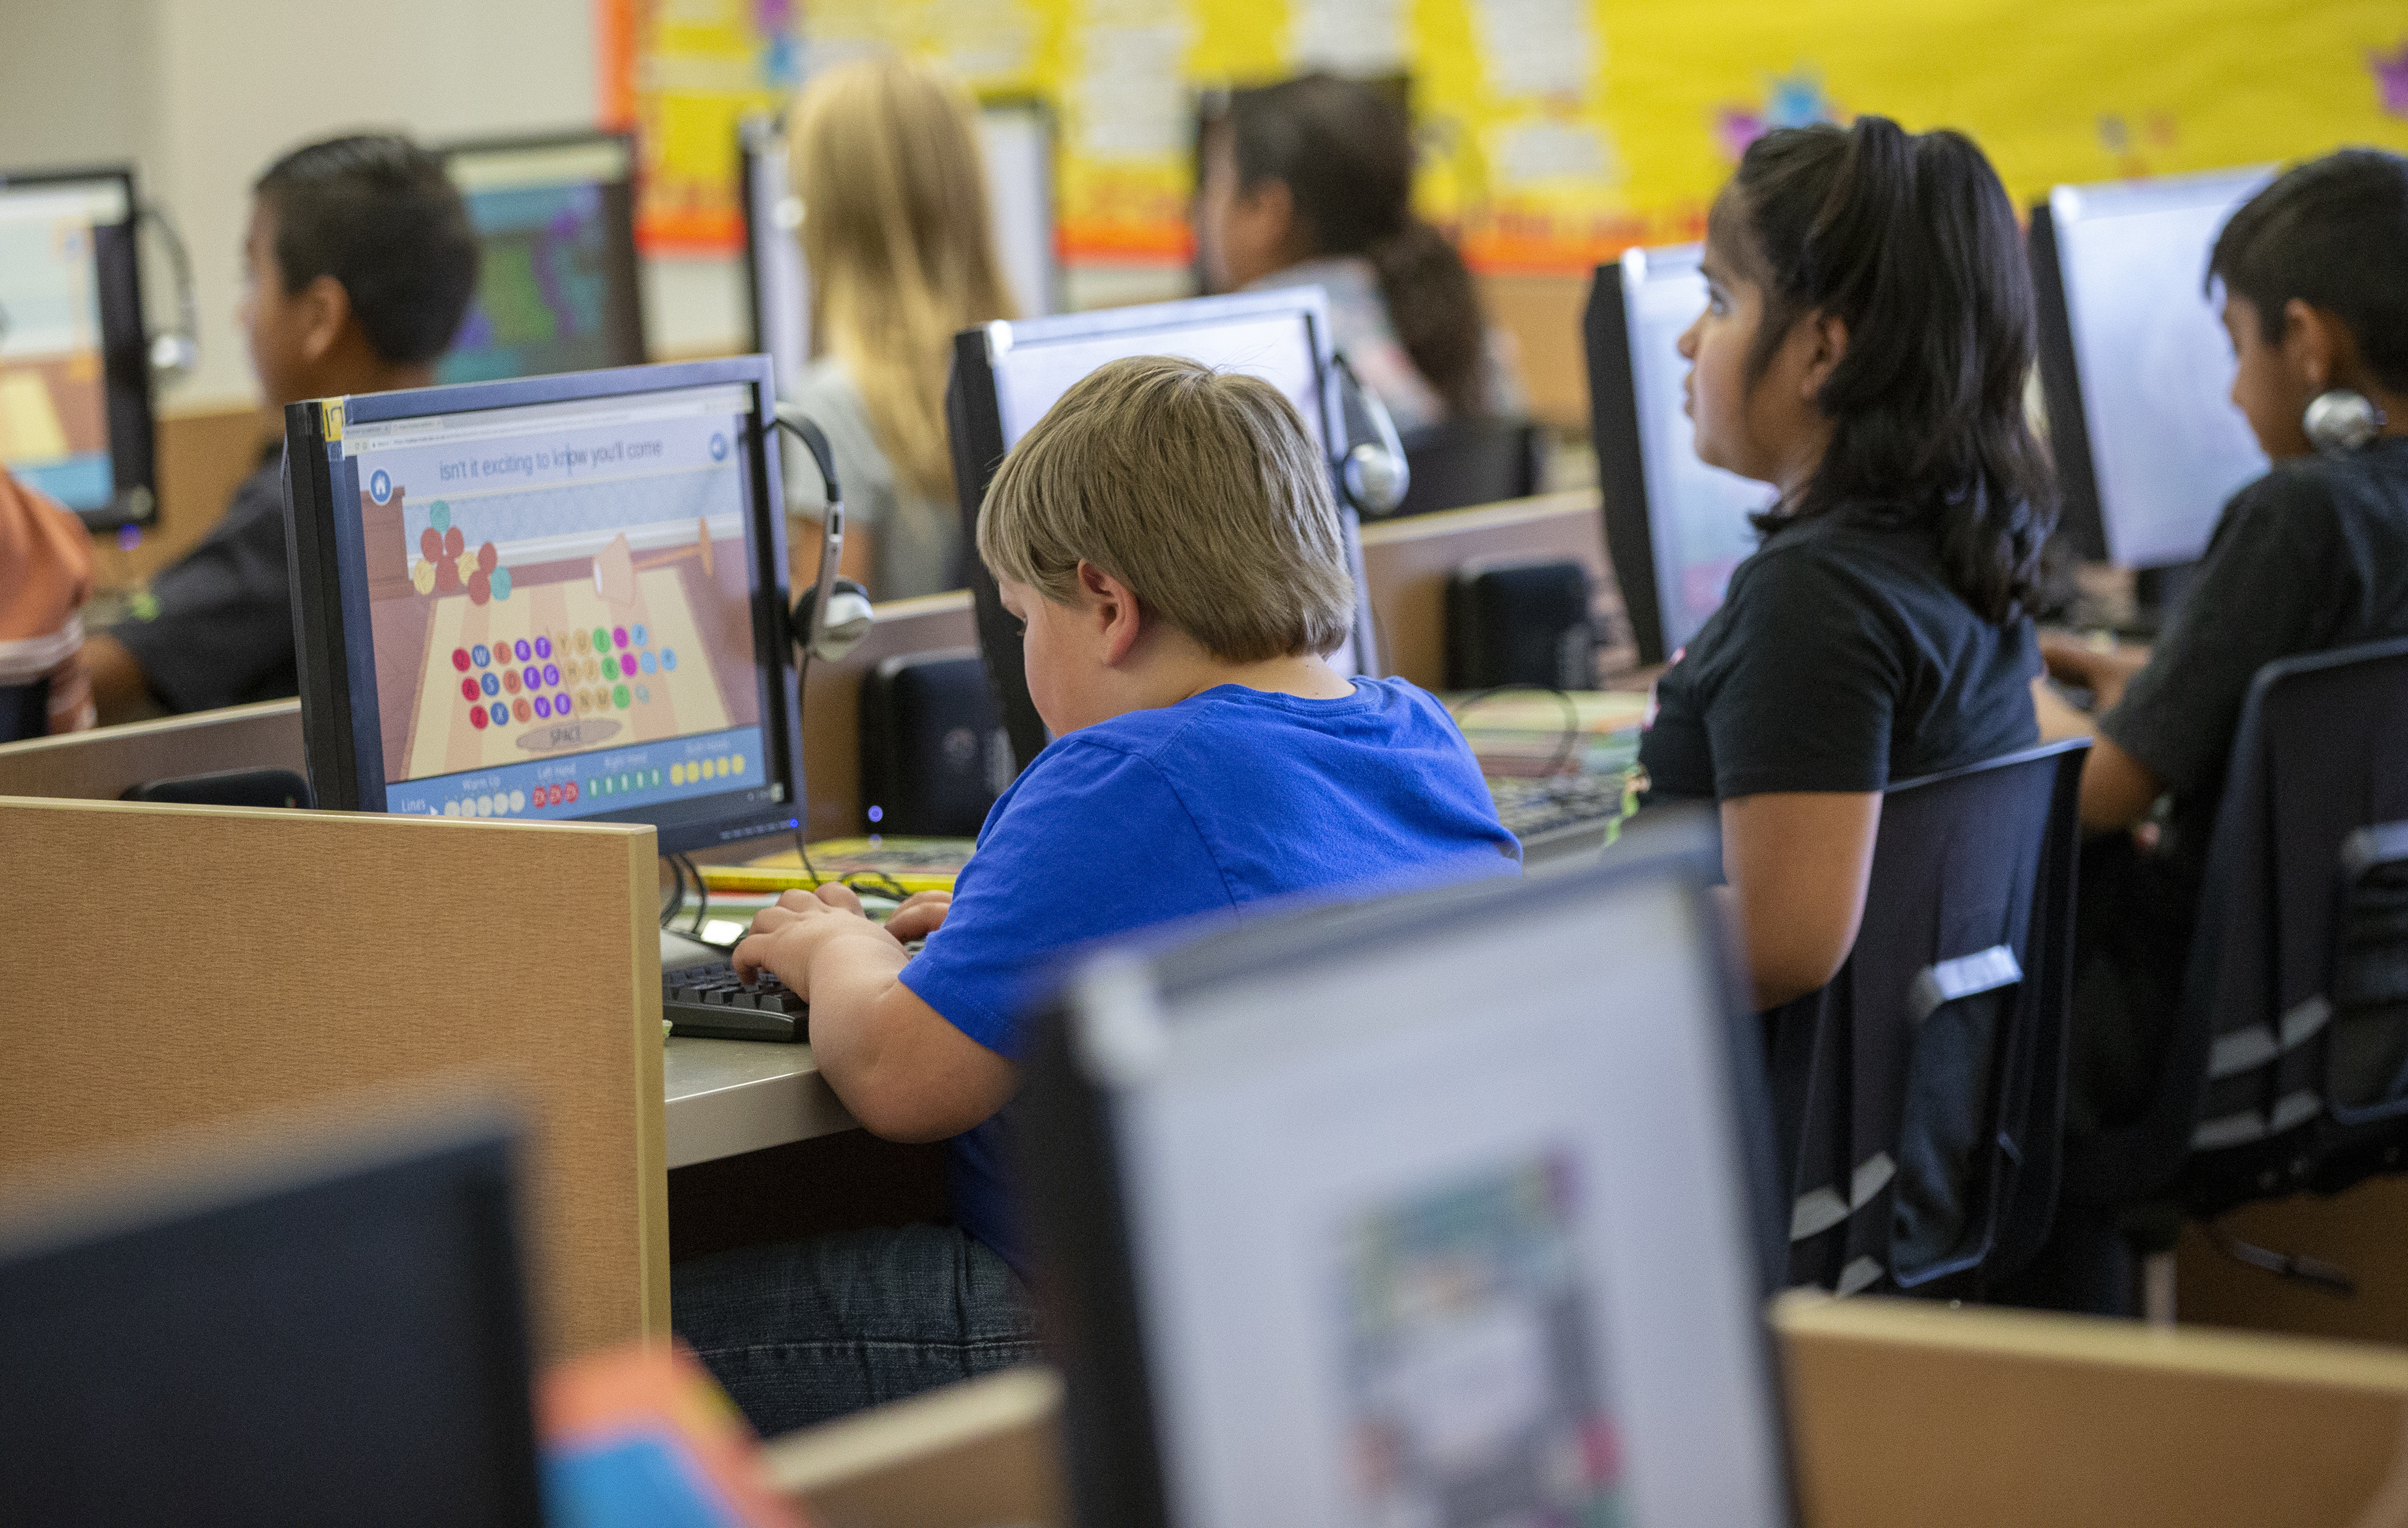 Students work on computers at Beaver School District's Belknap Elementary School.